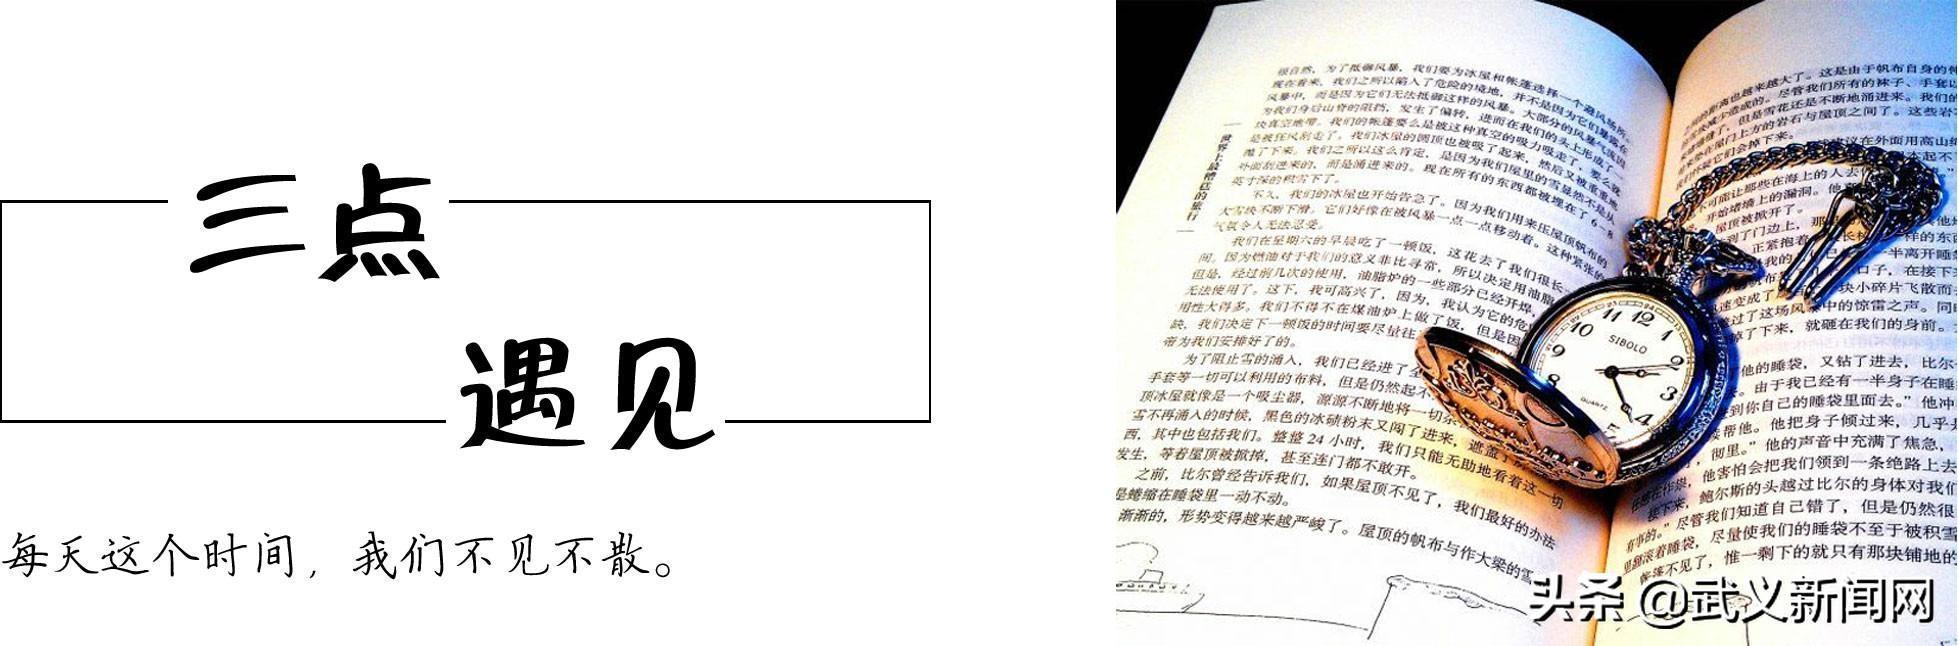 <b>解放记忆——纪念永康、武义、磐安解放60周年</b>